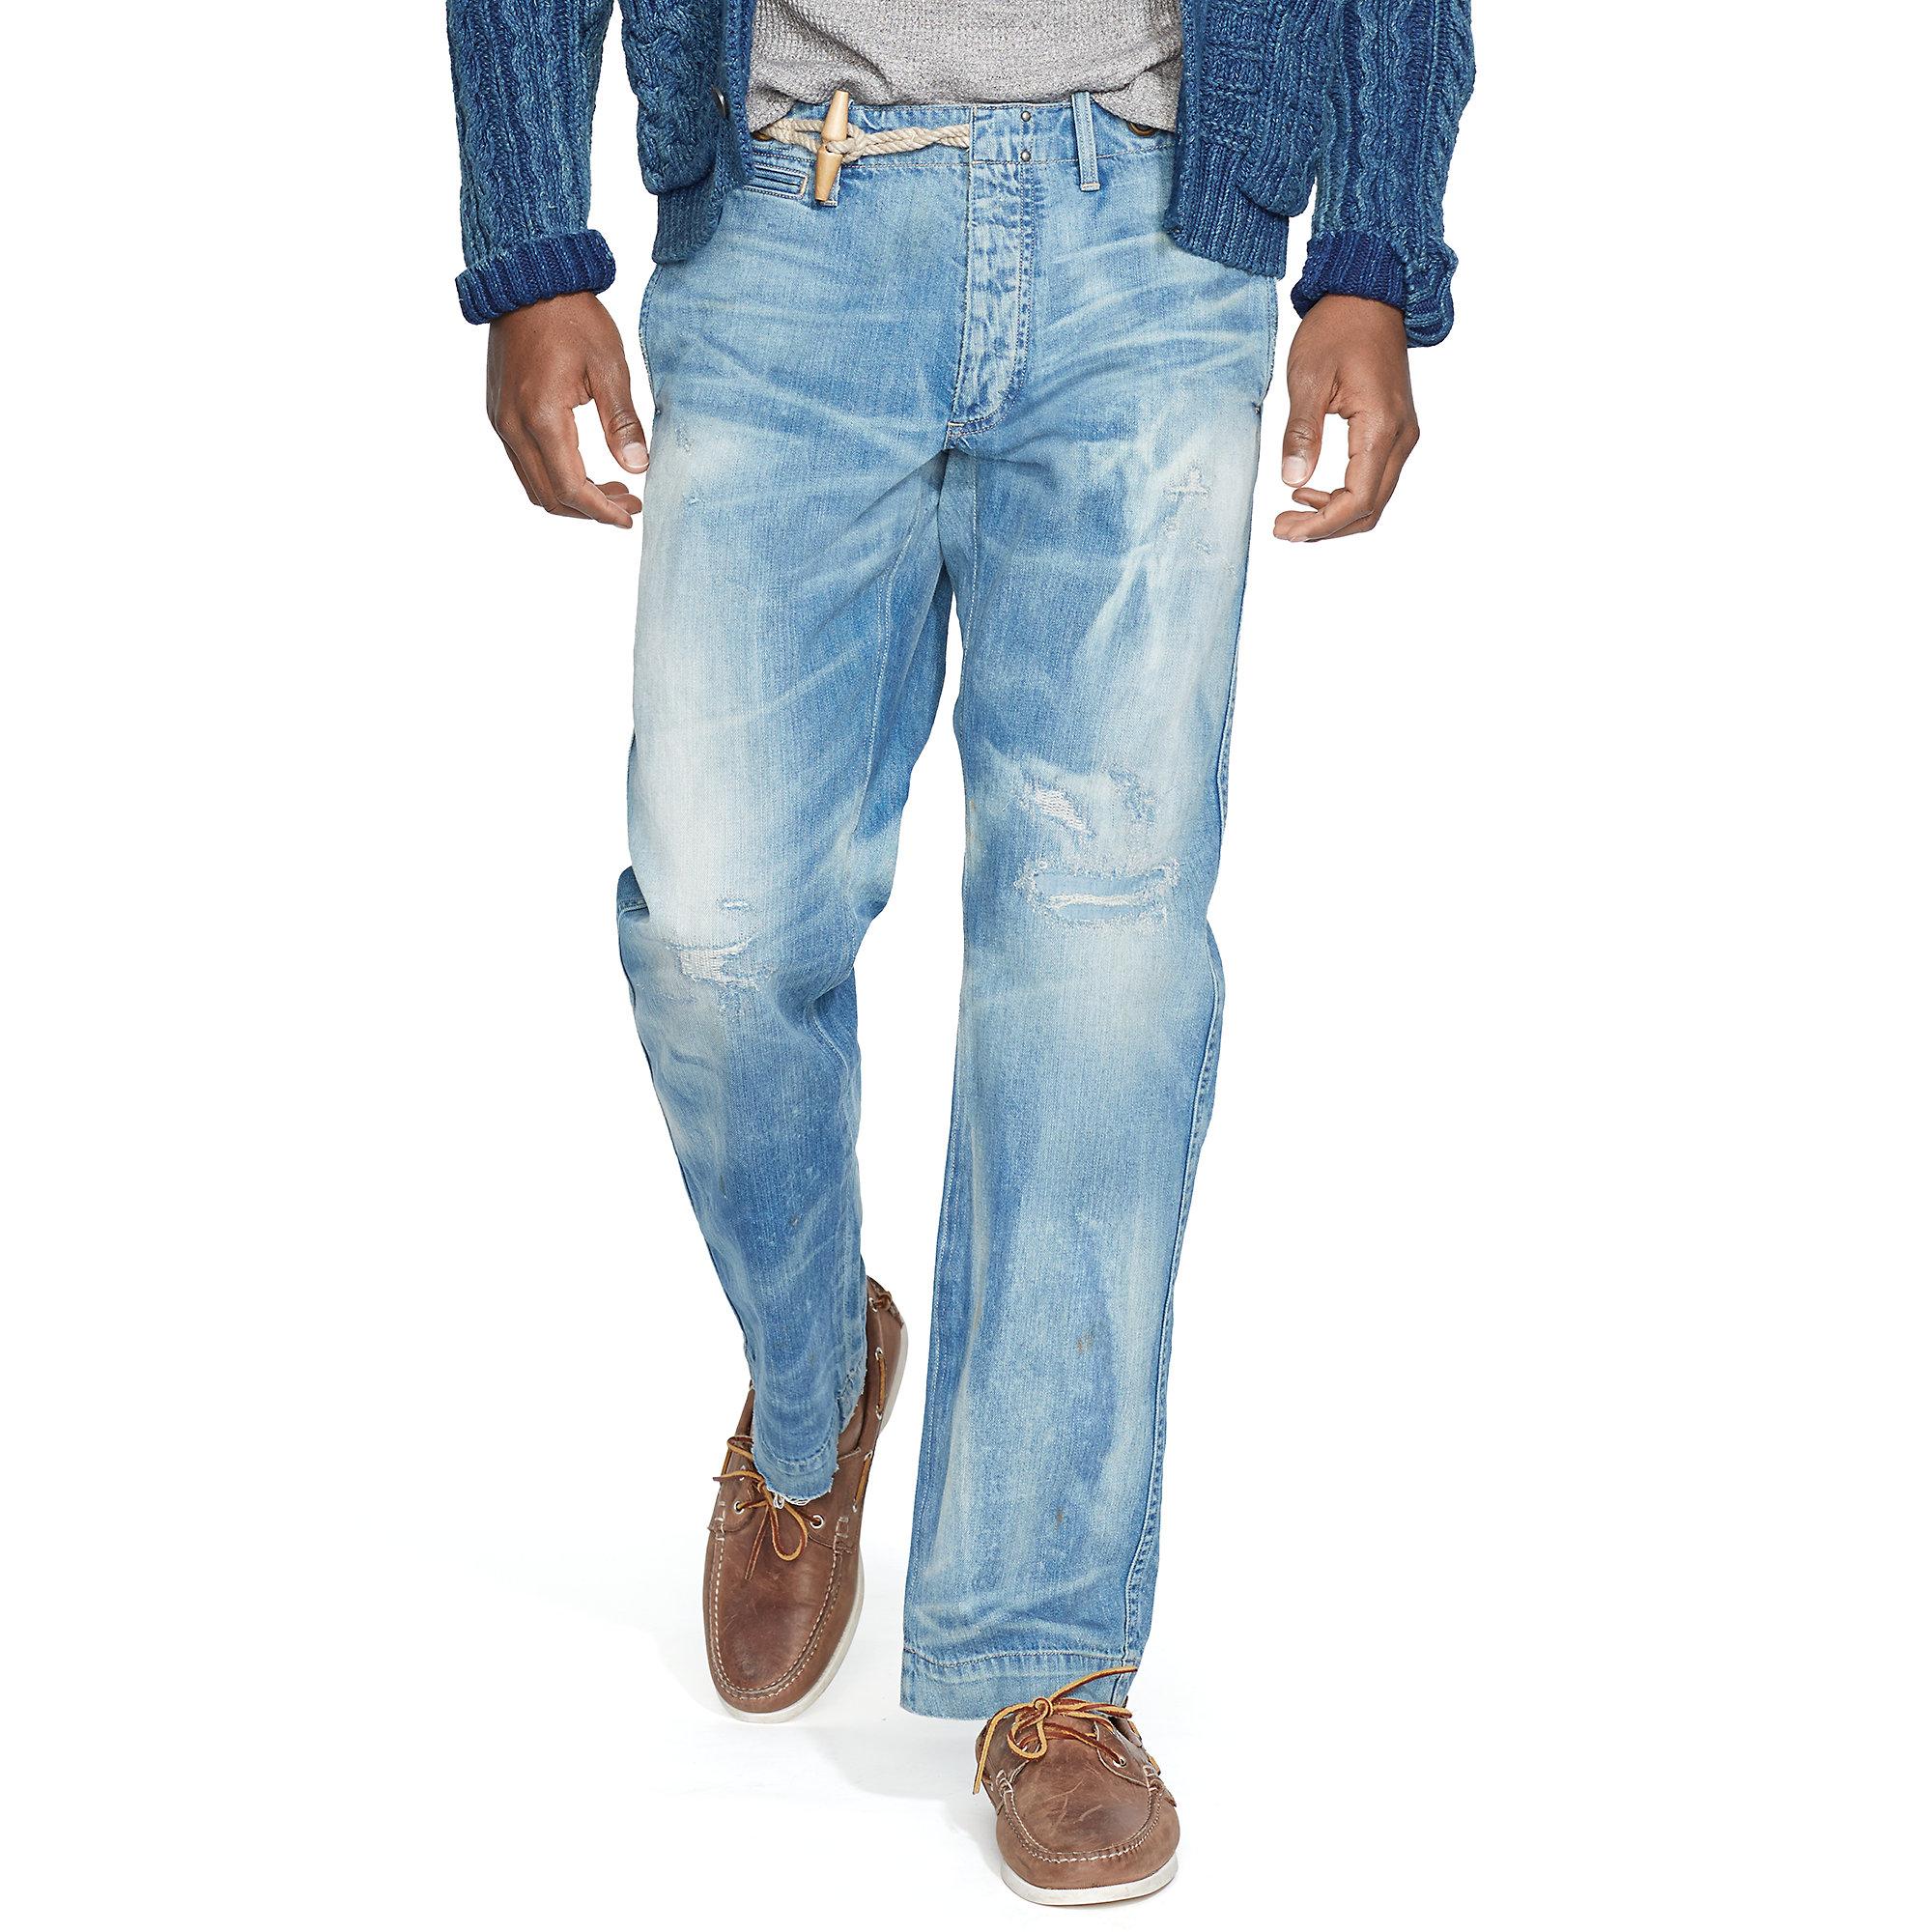 lyst polo ralph lauren nautical denim trouser in blue. Black Bedroom Furniture Sets. Home Design Ideas